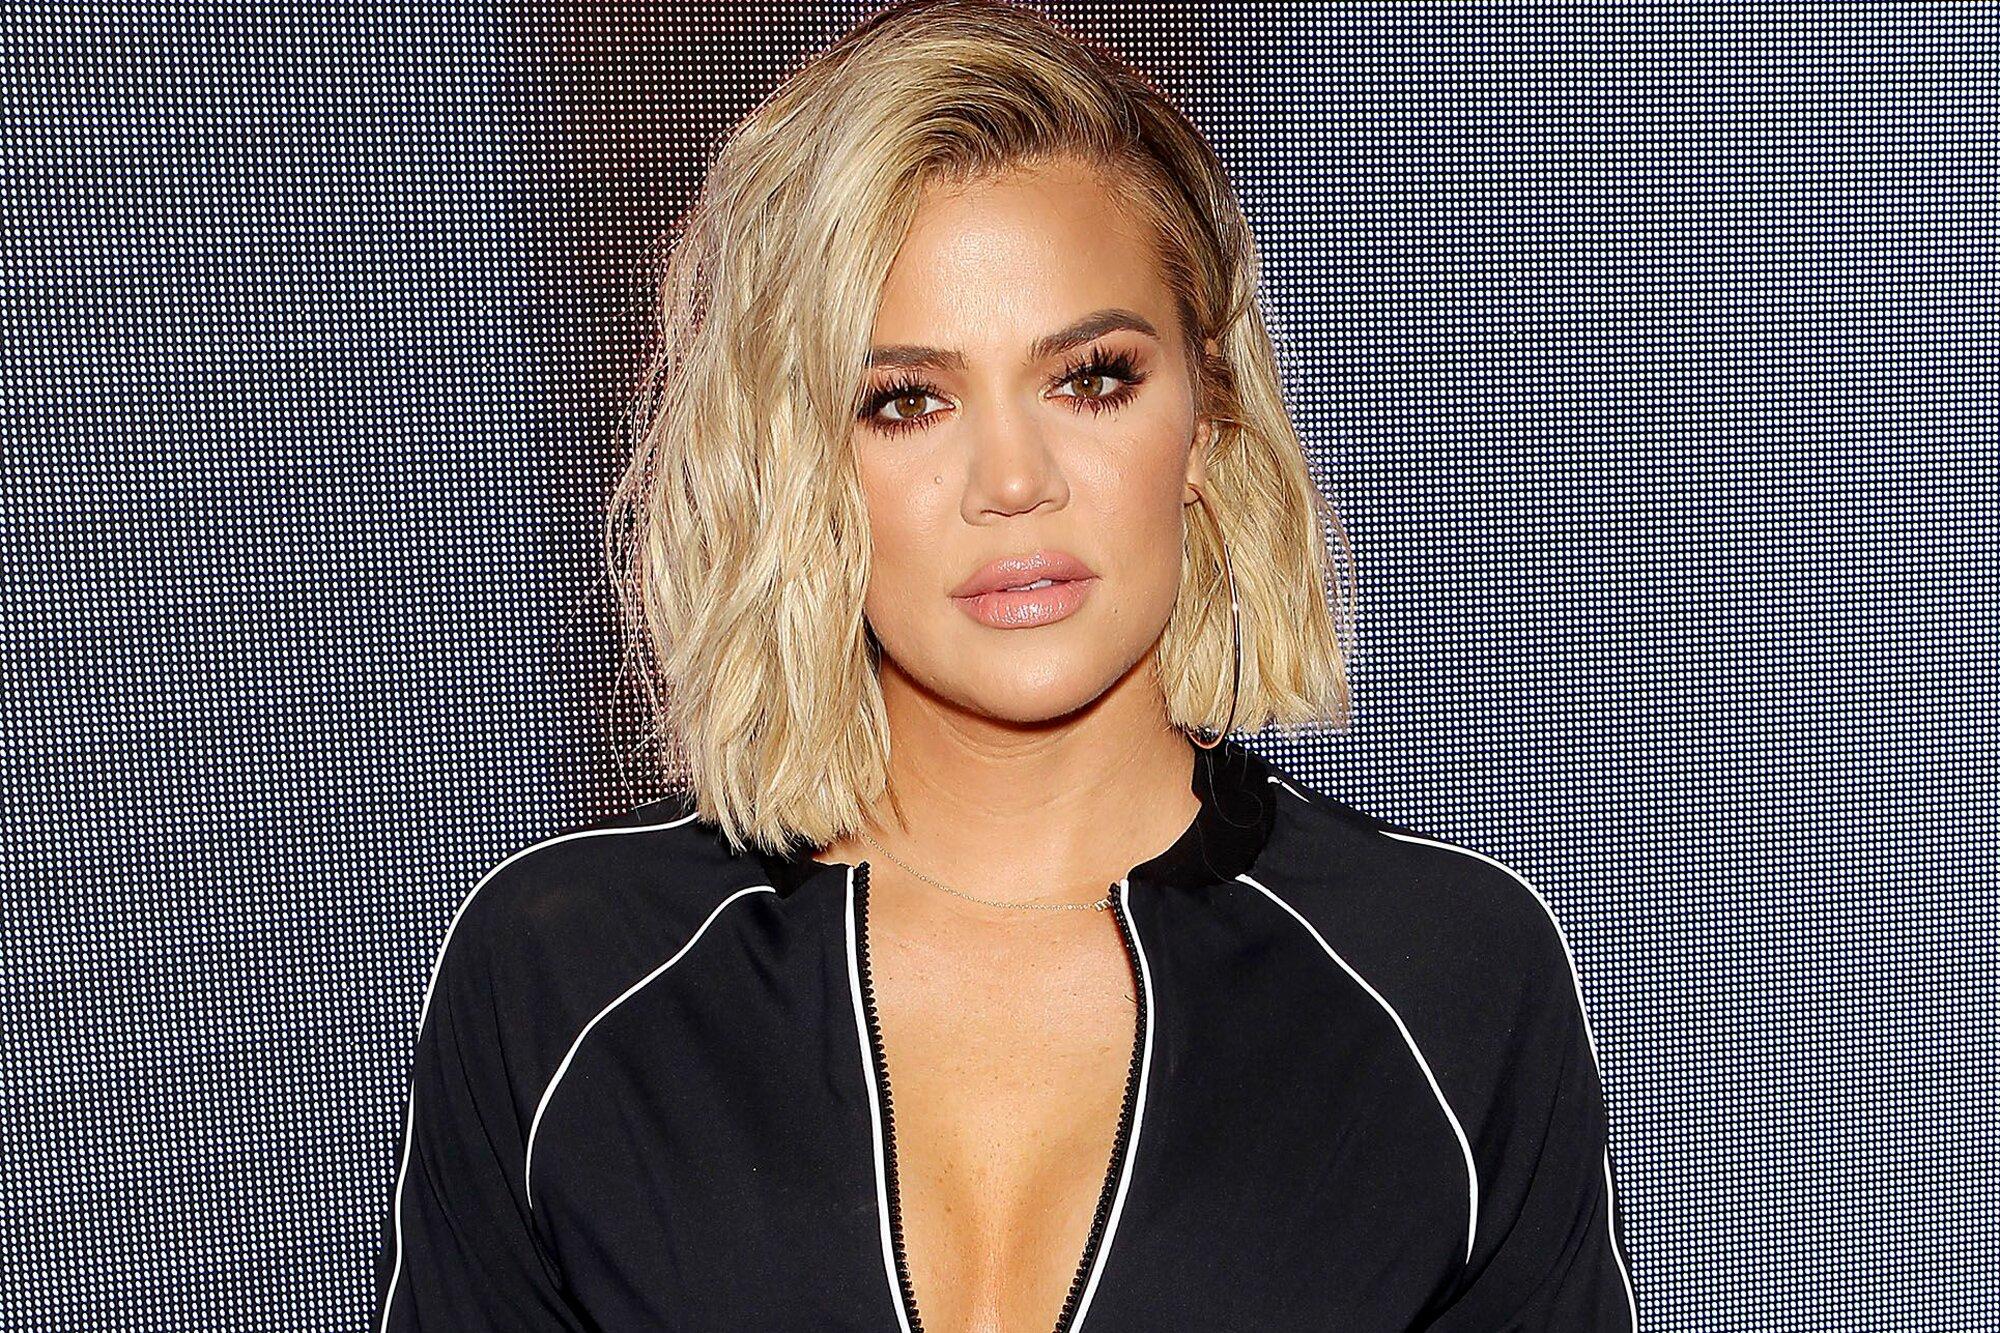 Khloe Kardashian Slams The Bachelor Creator Denies Shes The